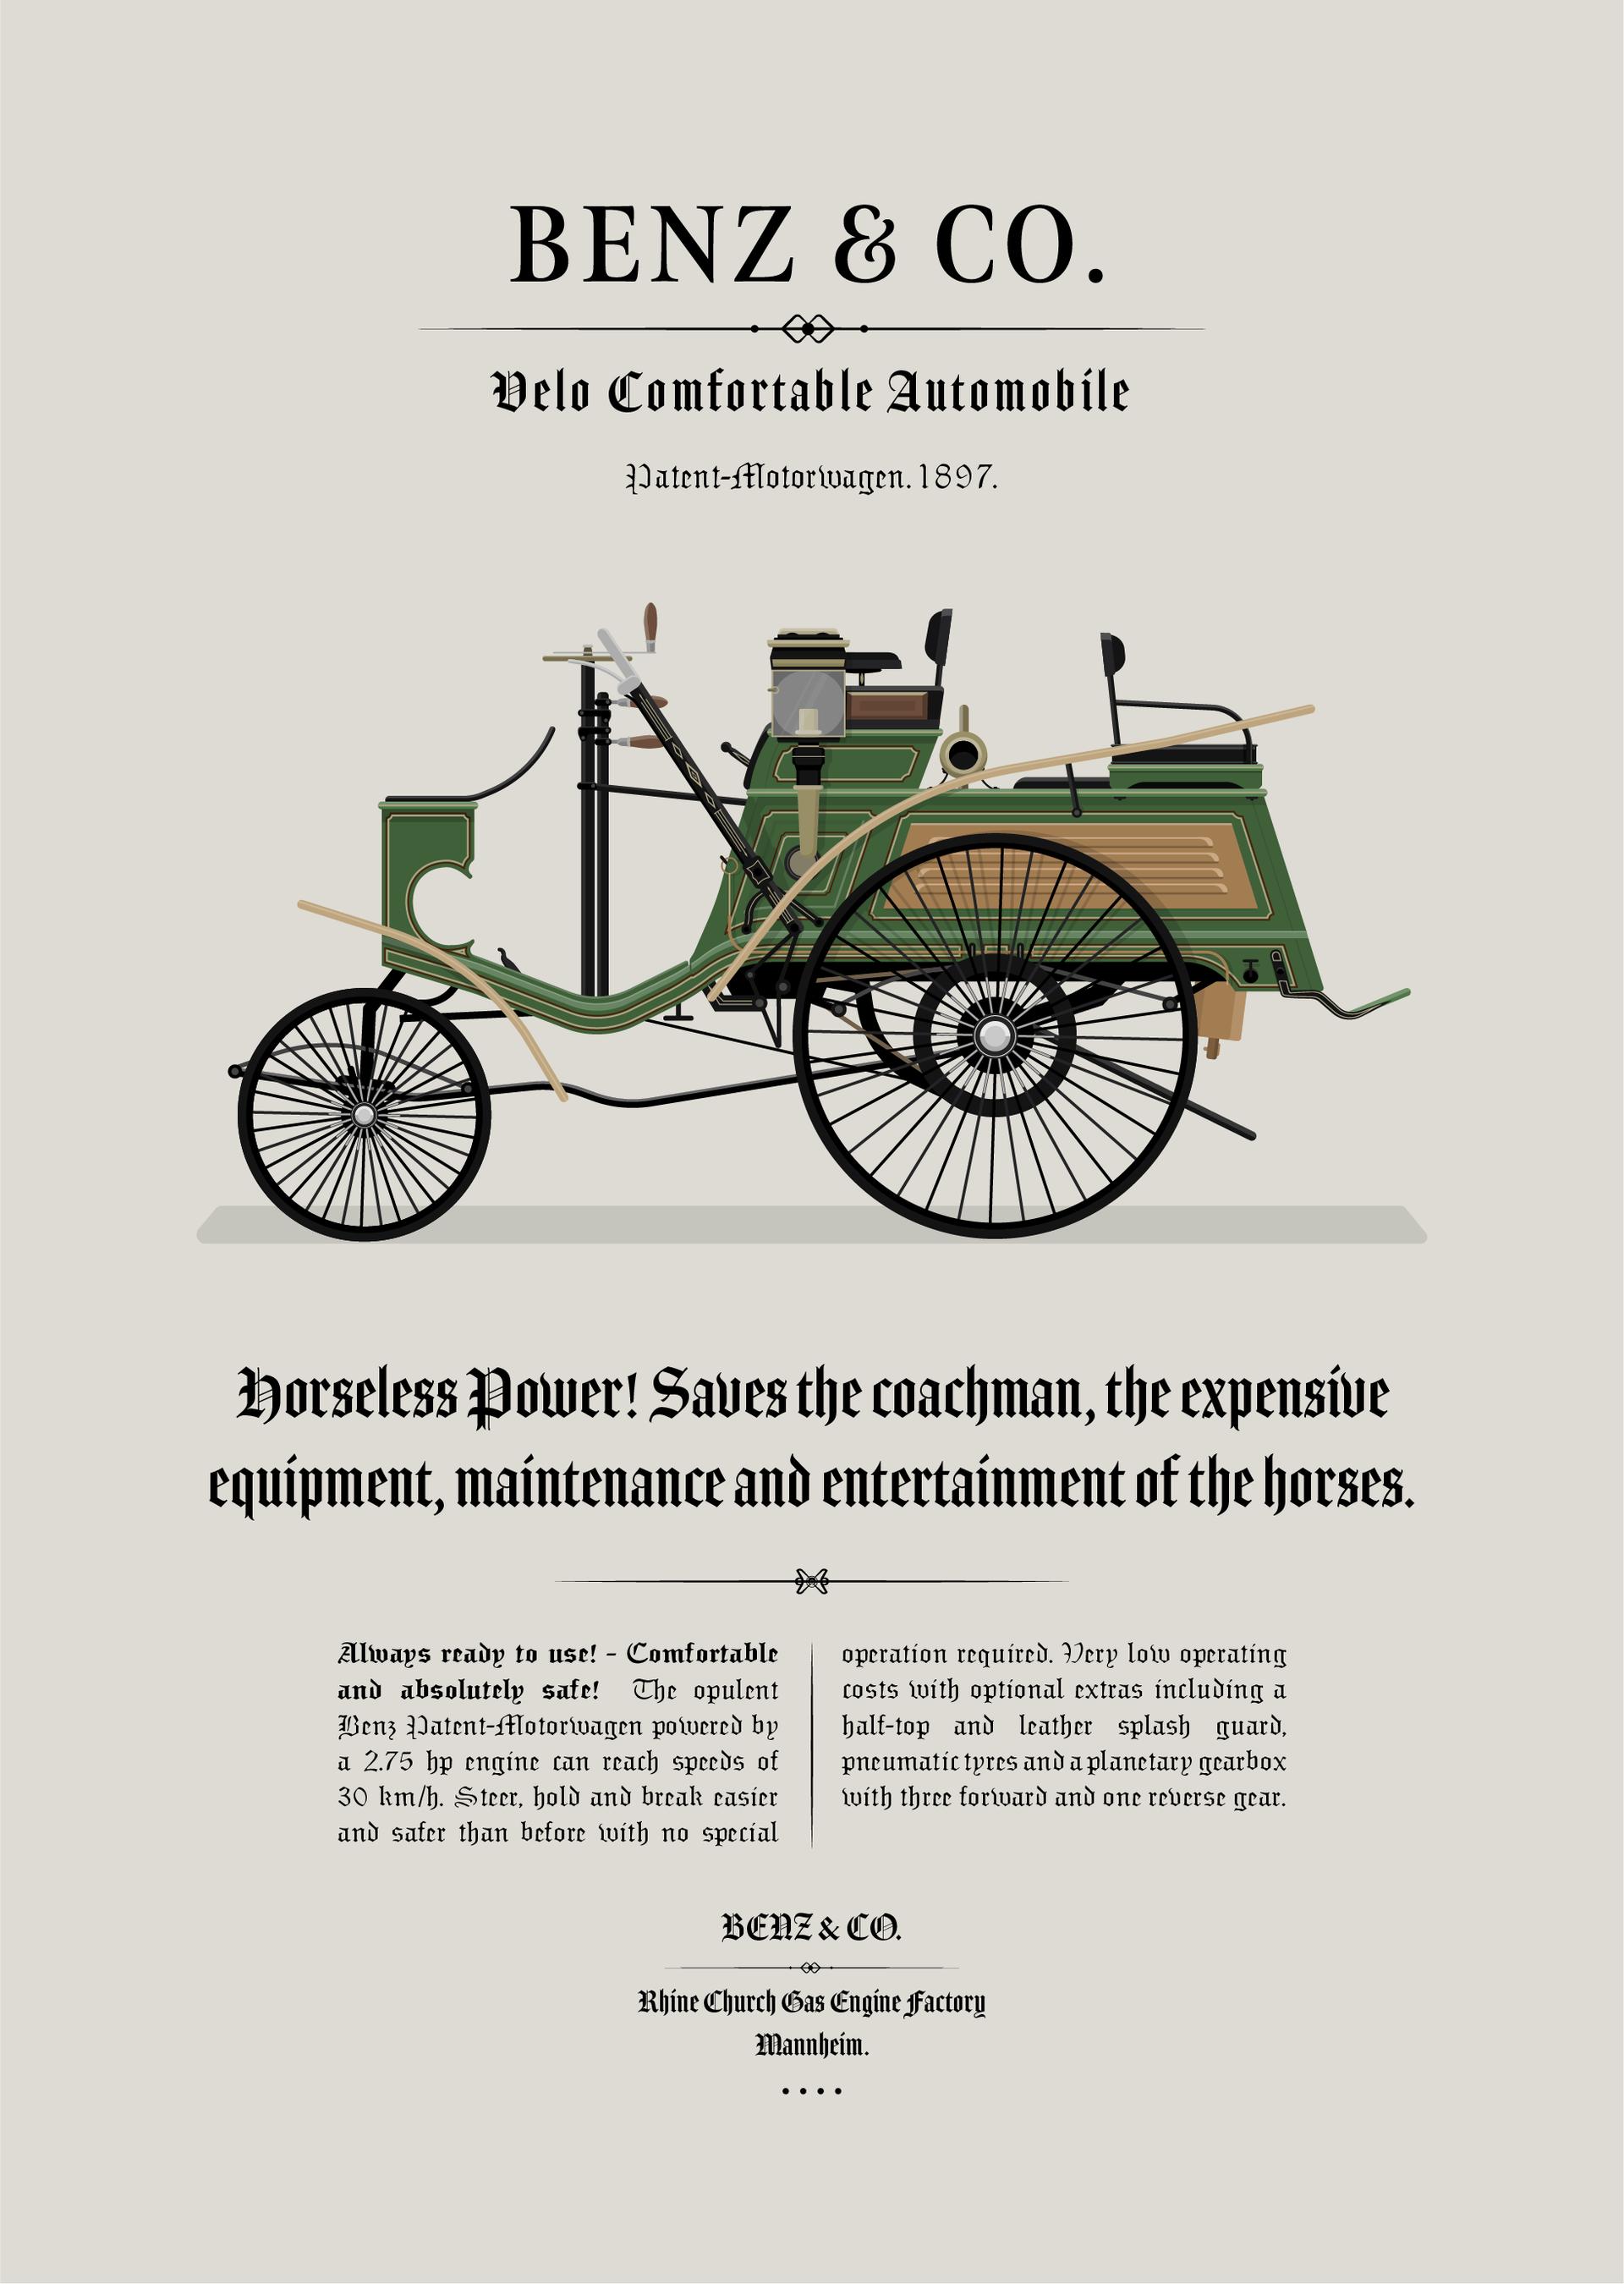 1897 Benz - Velo Comfortable Advertisement